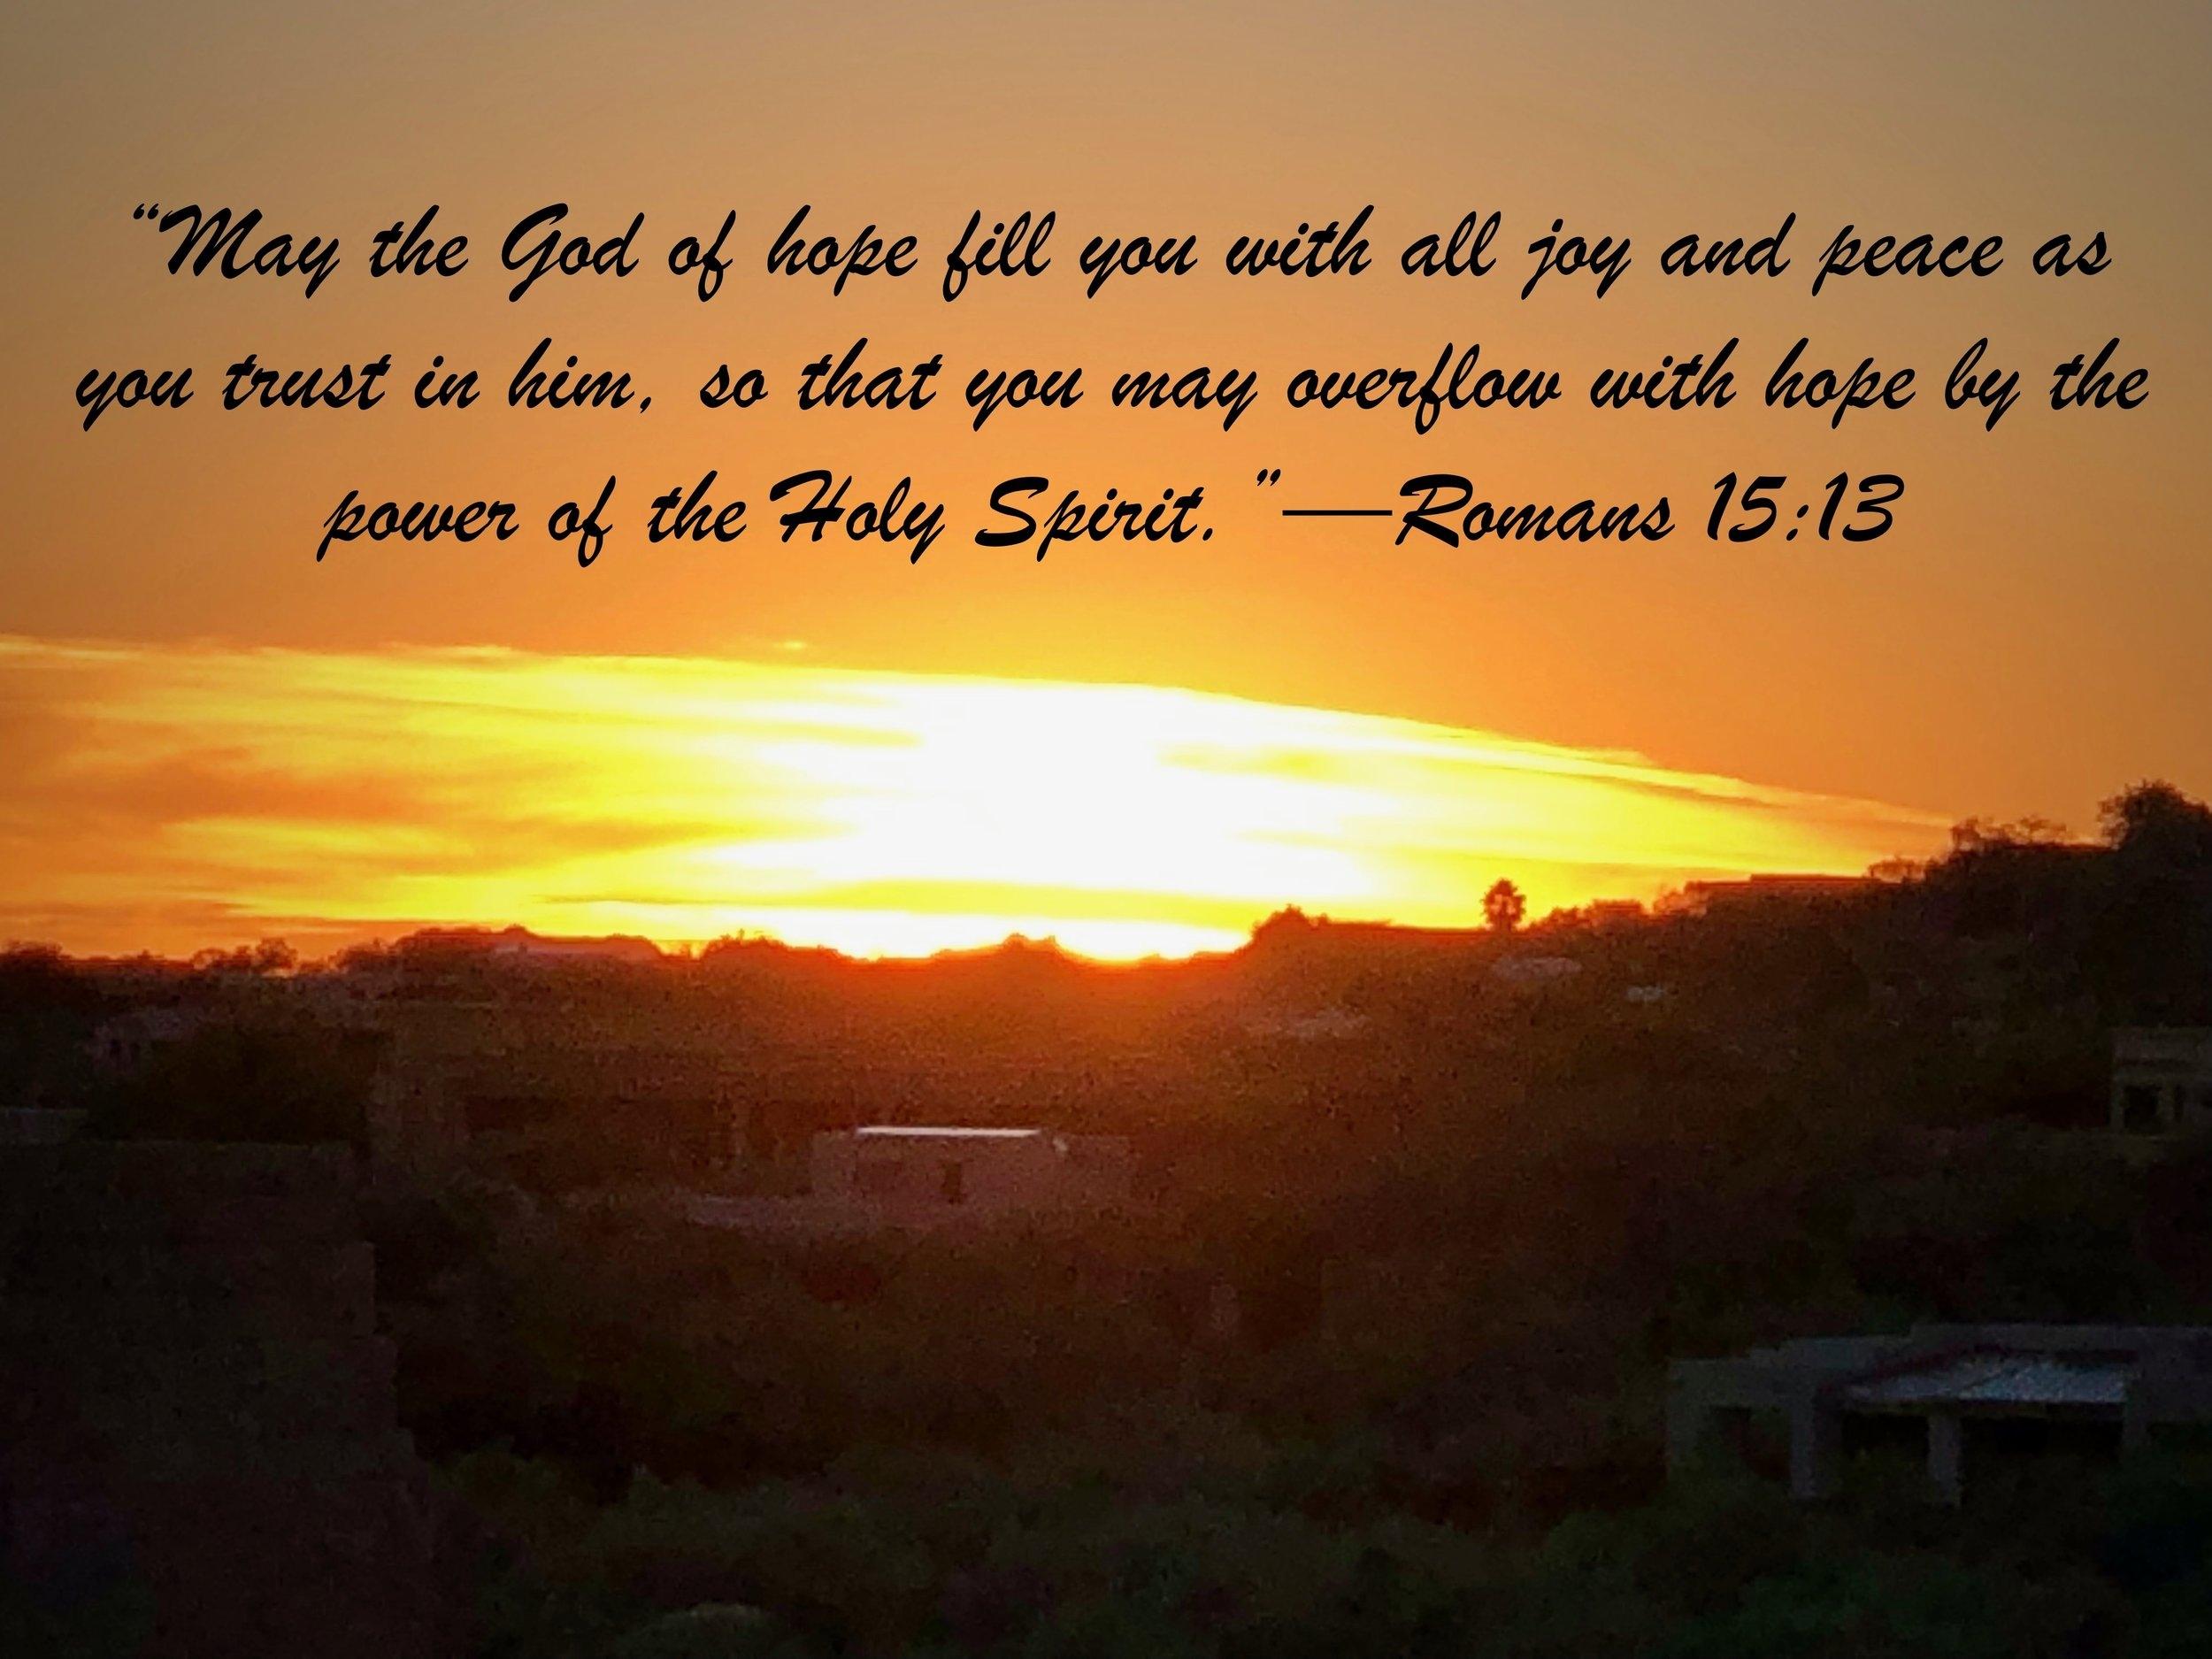 romans15:13.jpg